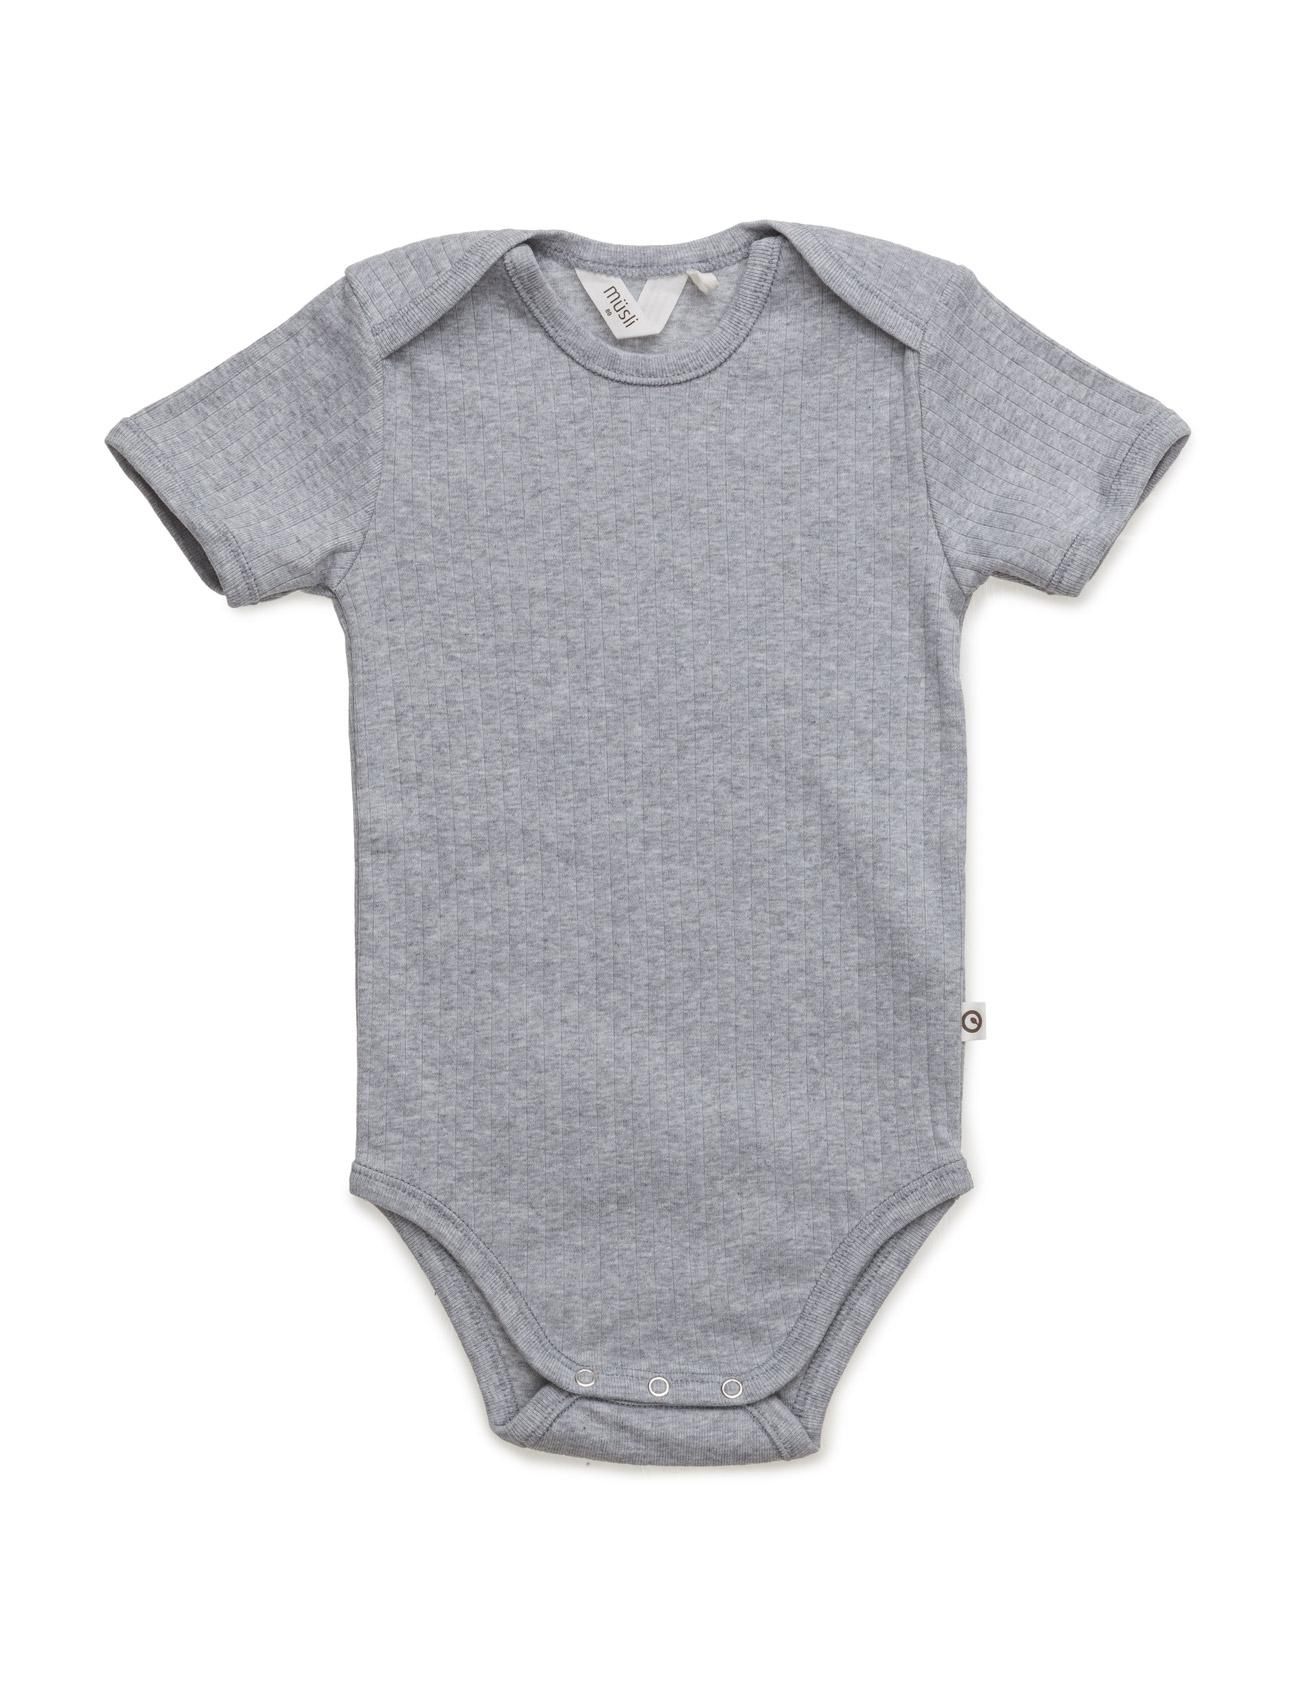 Cozy S/Sl Body MŸsli by Green Cotton Langærmede bodies til Børn i Pale Greymarl